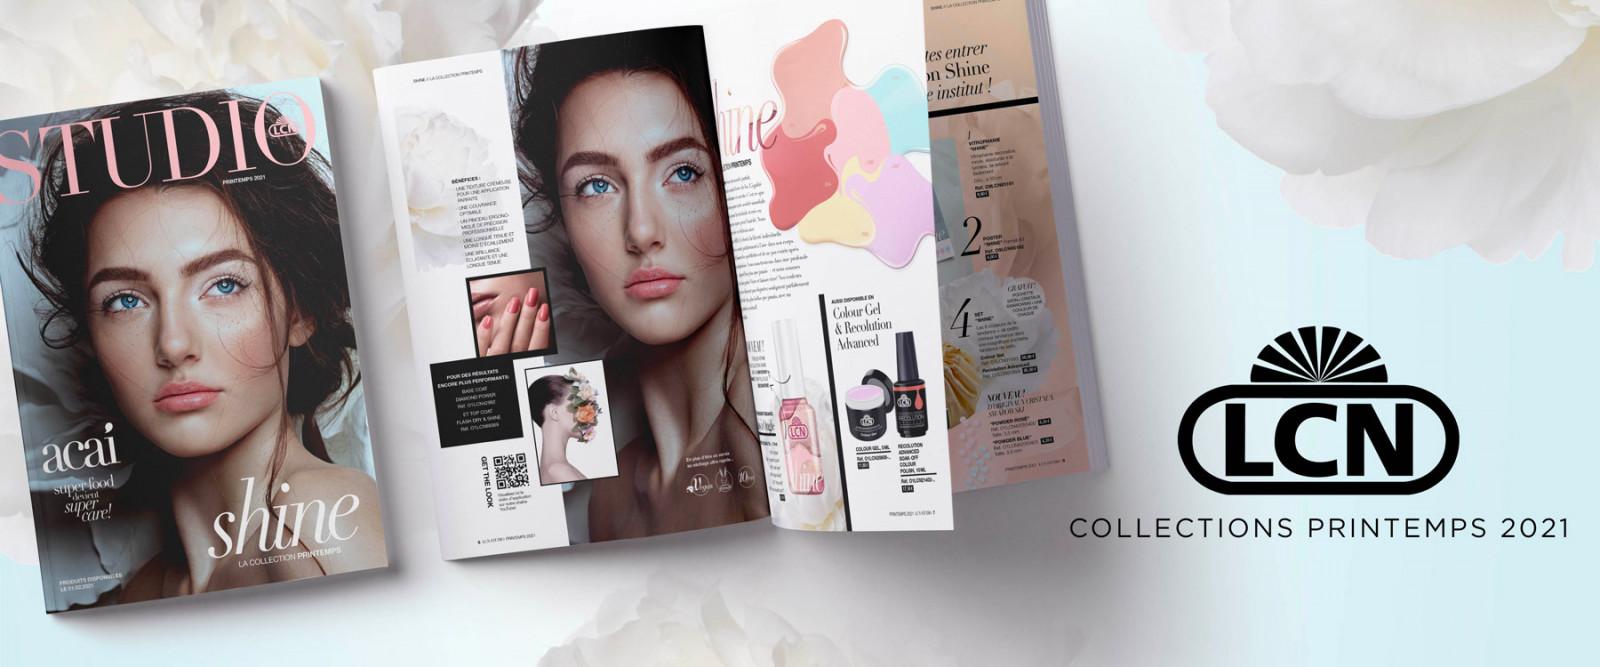 Collection Printemps 2021 - LCN